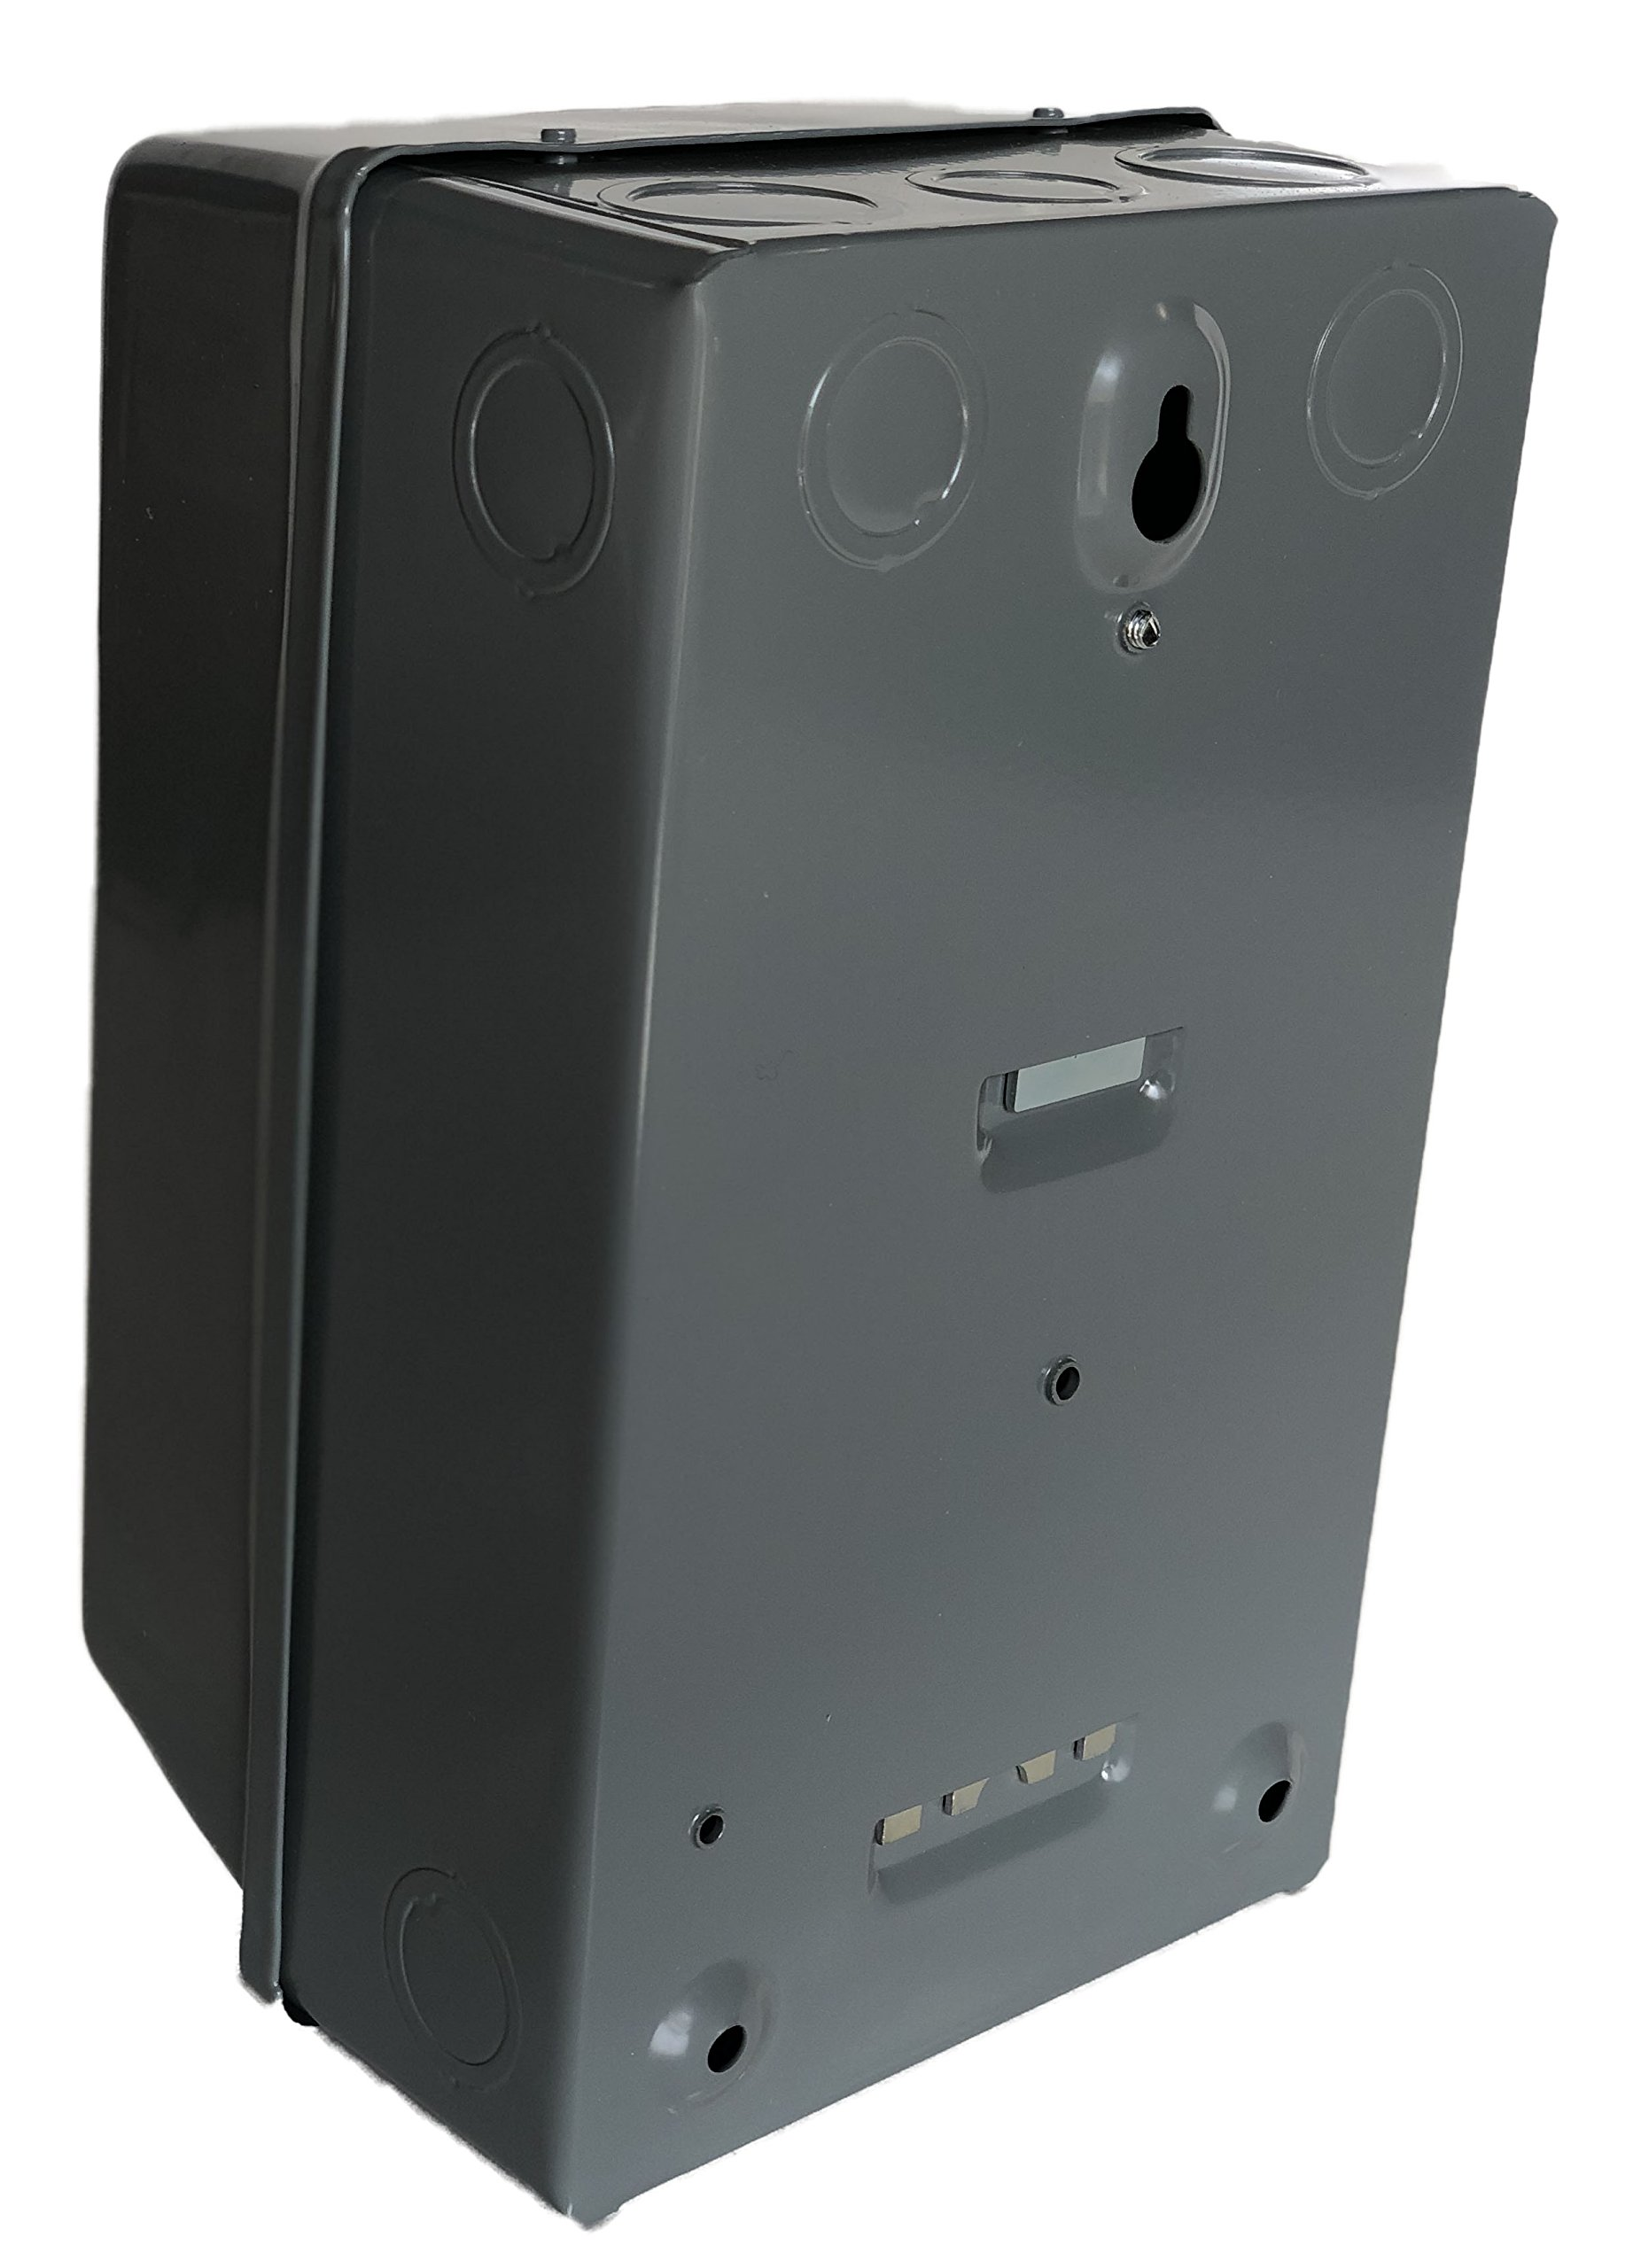 5HP 1-Phase 230V Definite Purpose Motor Starter for Electric Motor from SQUARE D, Model 8911DPSG32V09, 8911DPSO32V09 by Square D (Image #3)